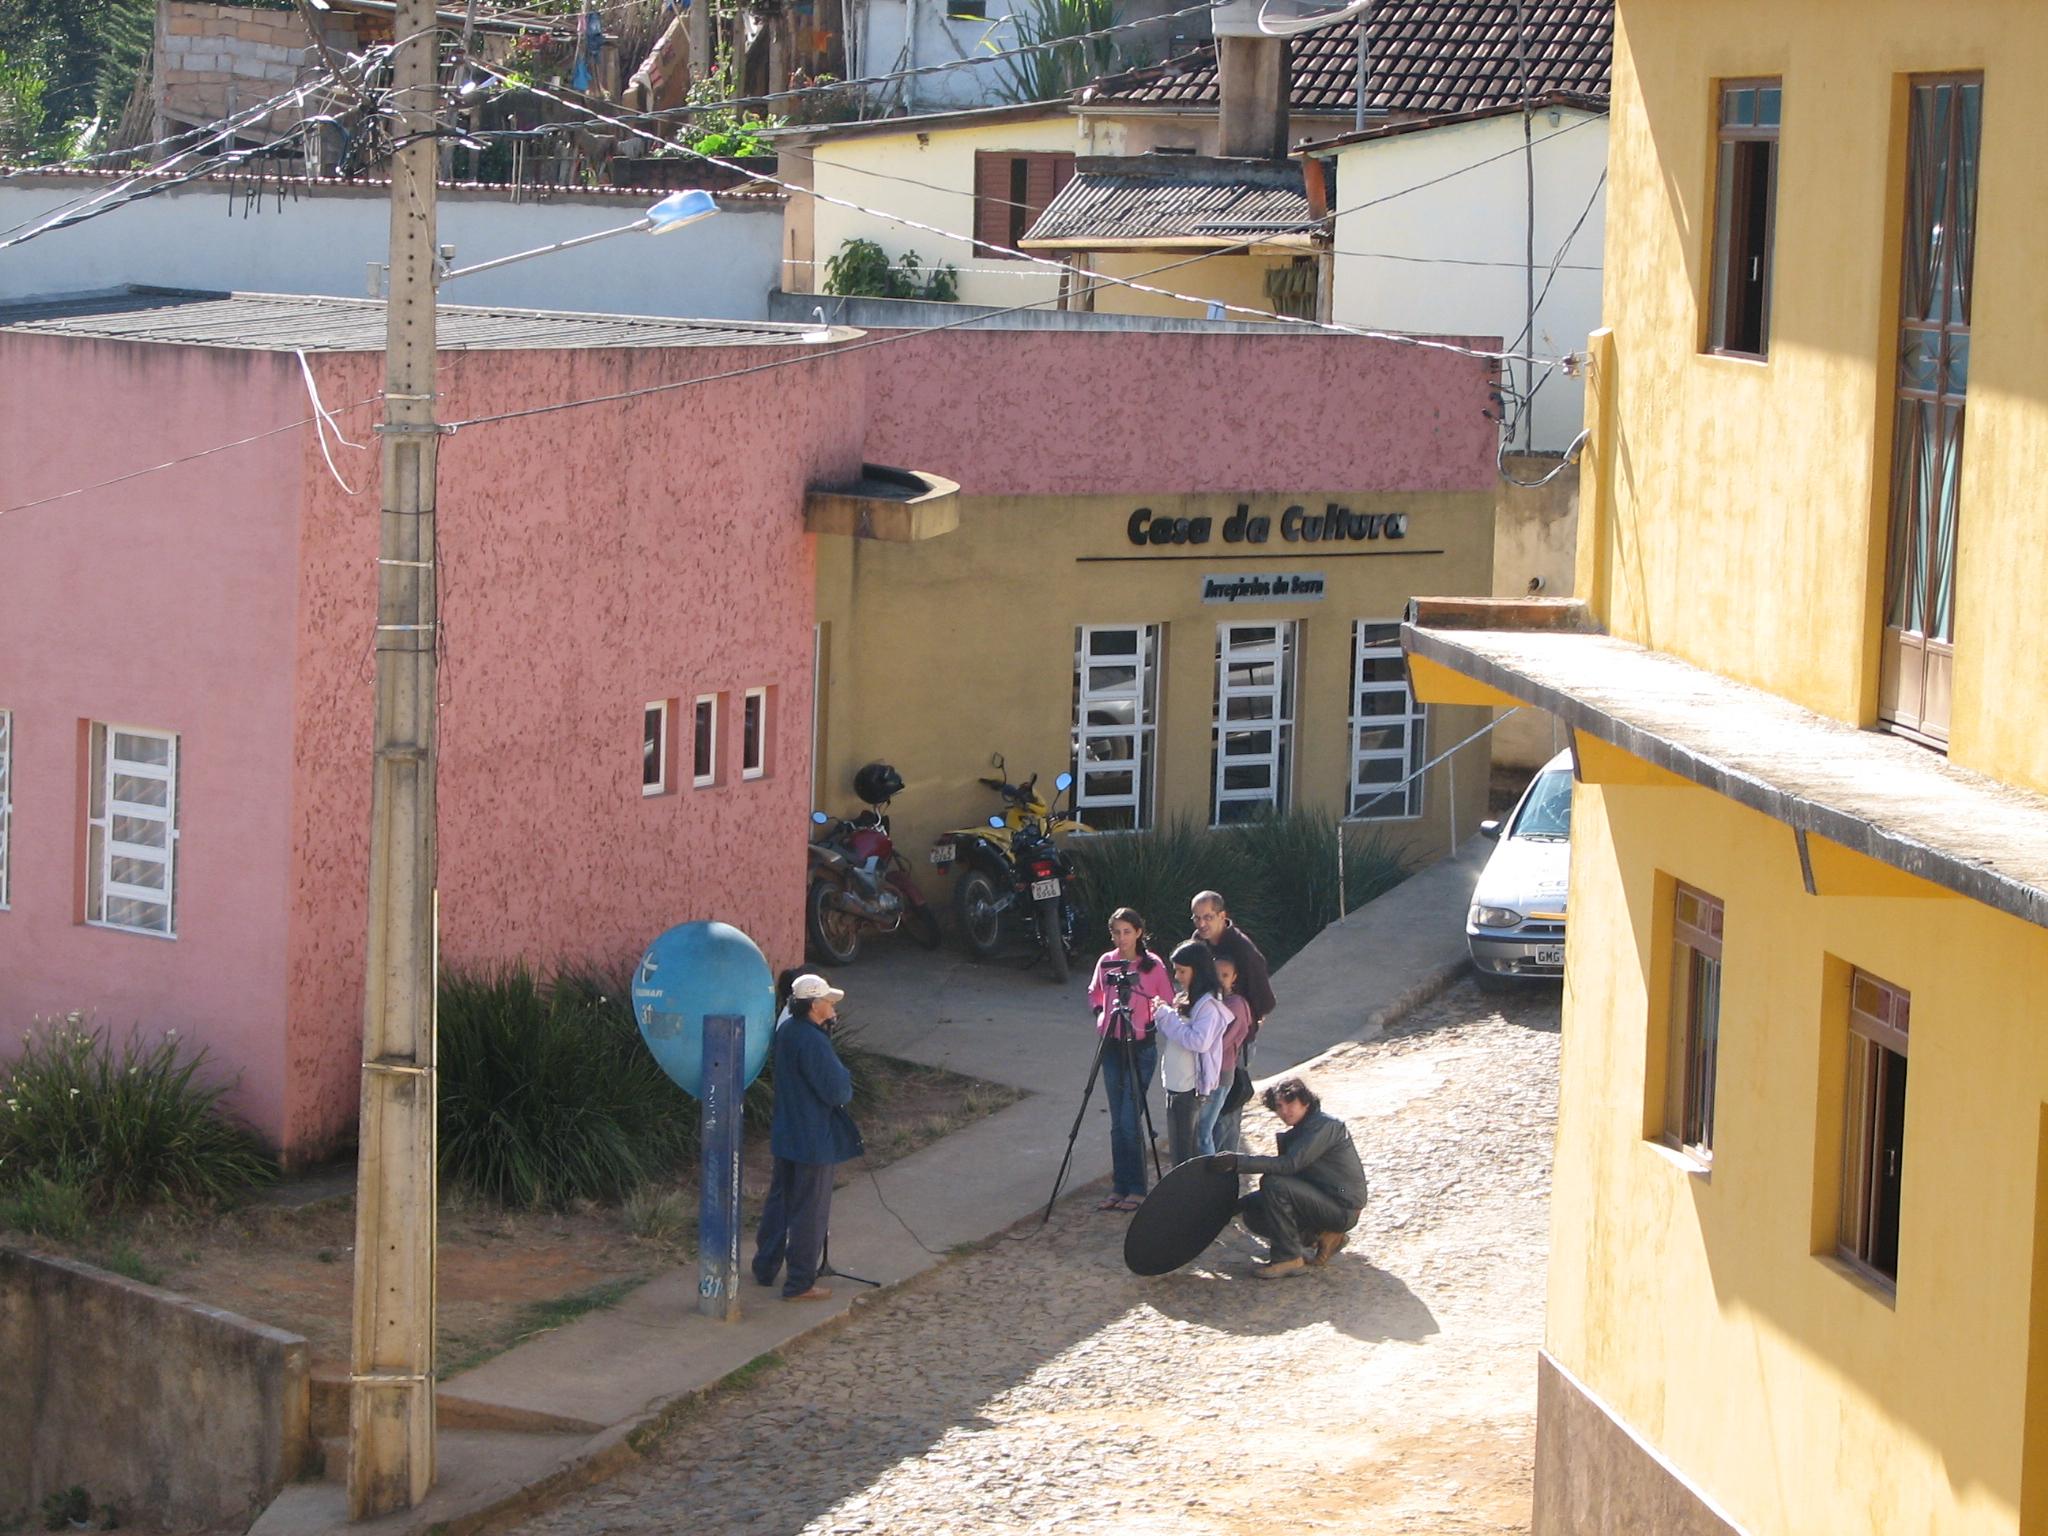 OFICINA DE CINEMA EM ARAPONGA 2011